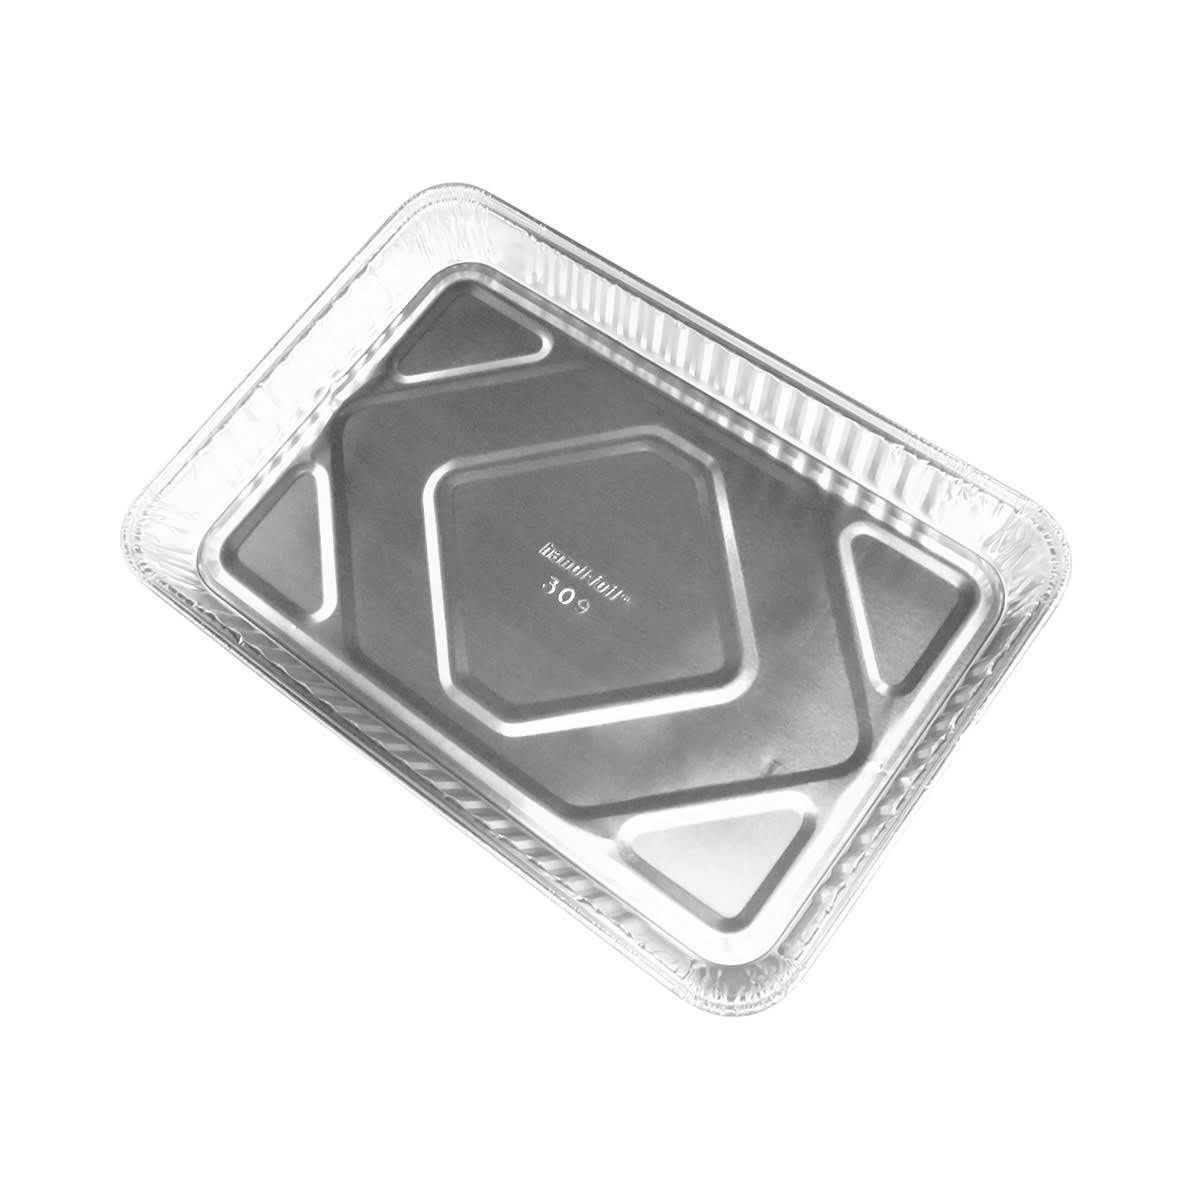 Handi-Foil Aluminum 1/4 Size Sheet Cake Pan, 100 units by Handi-Foil (Image #4)